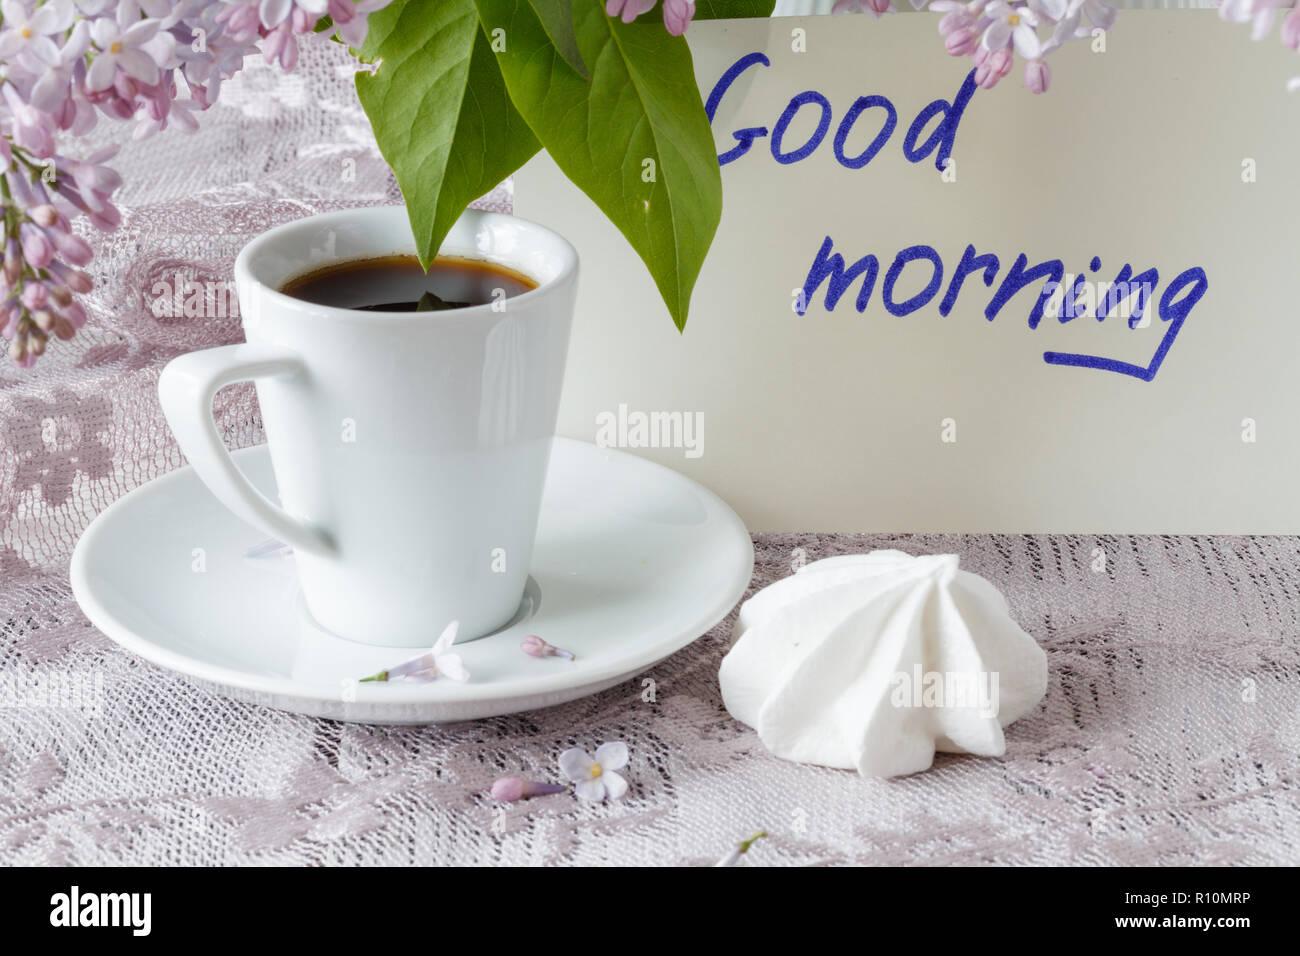 Guten Morgen Mit Kaffee Guten Morgen Mit Kaffee 2019 12 03